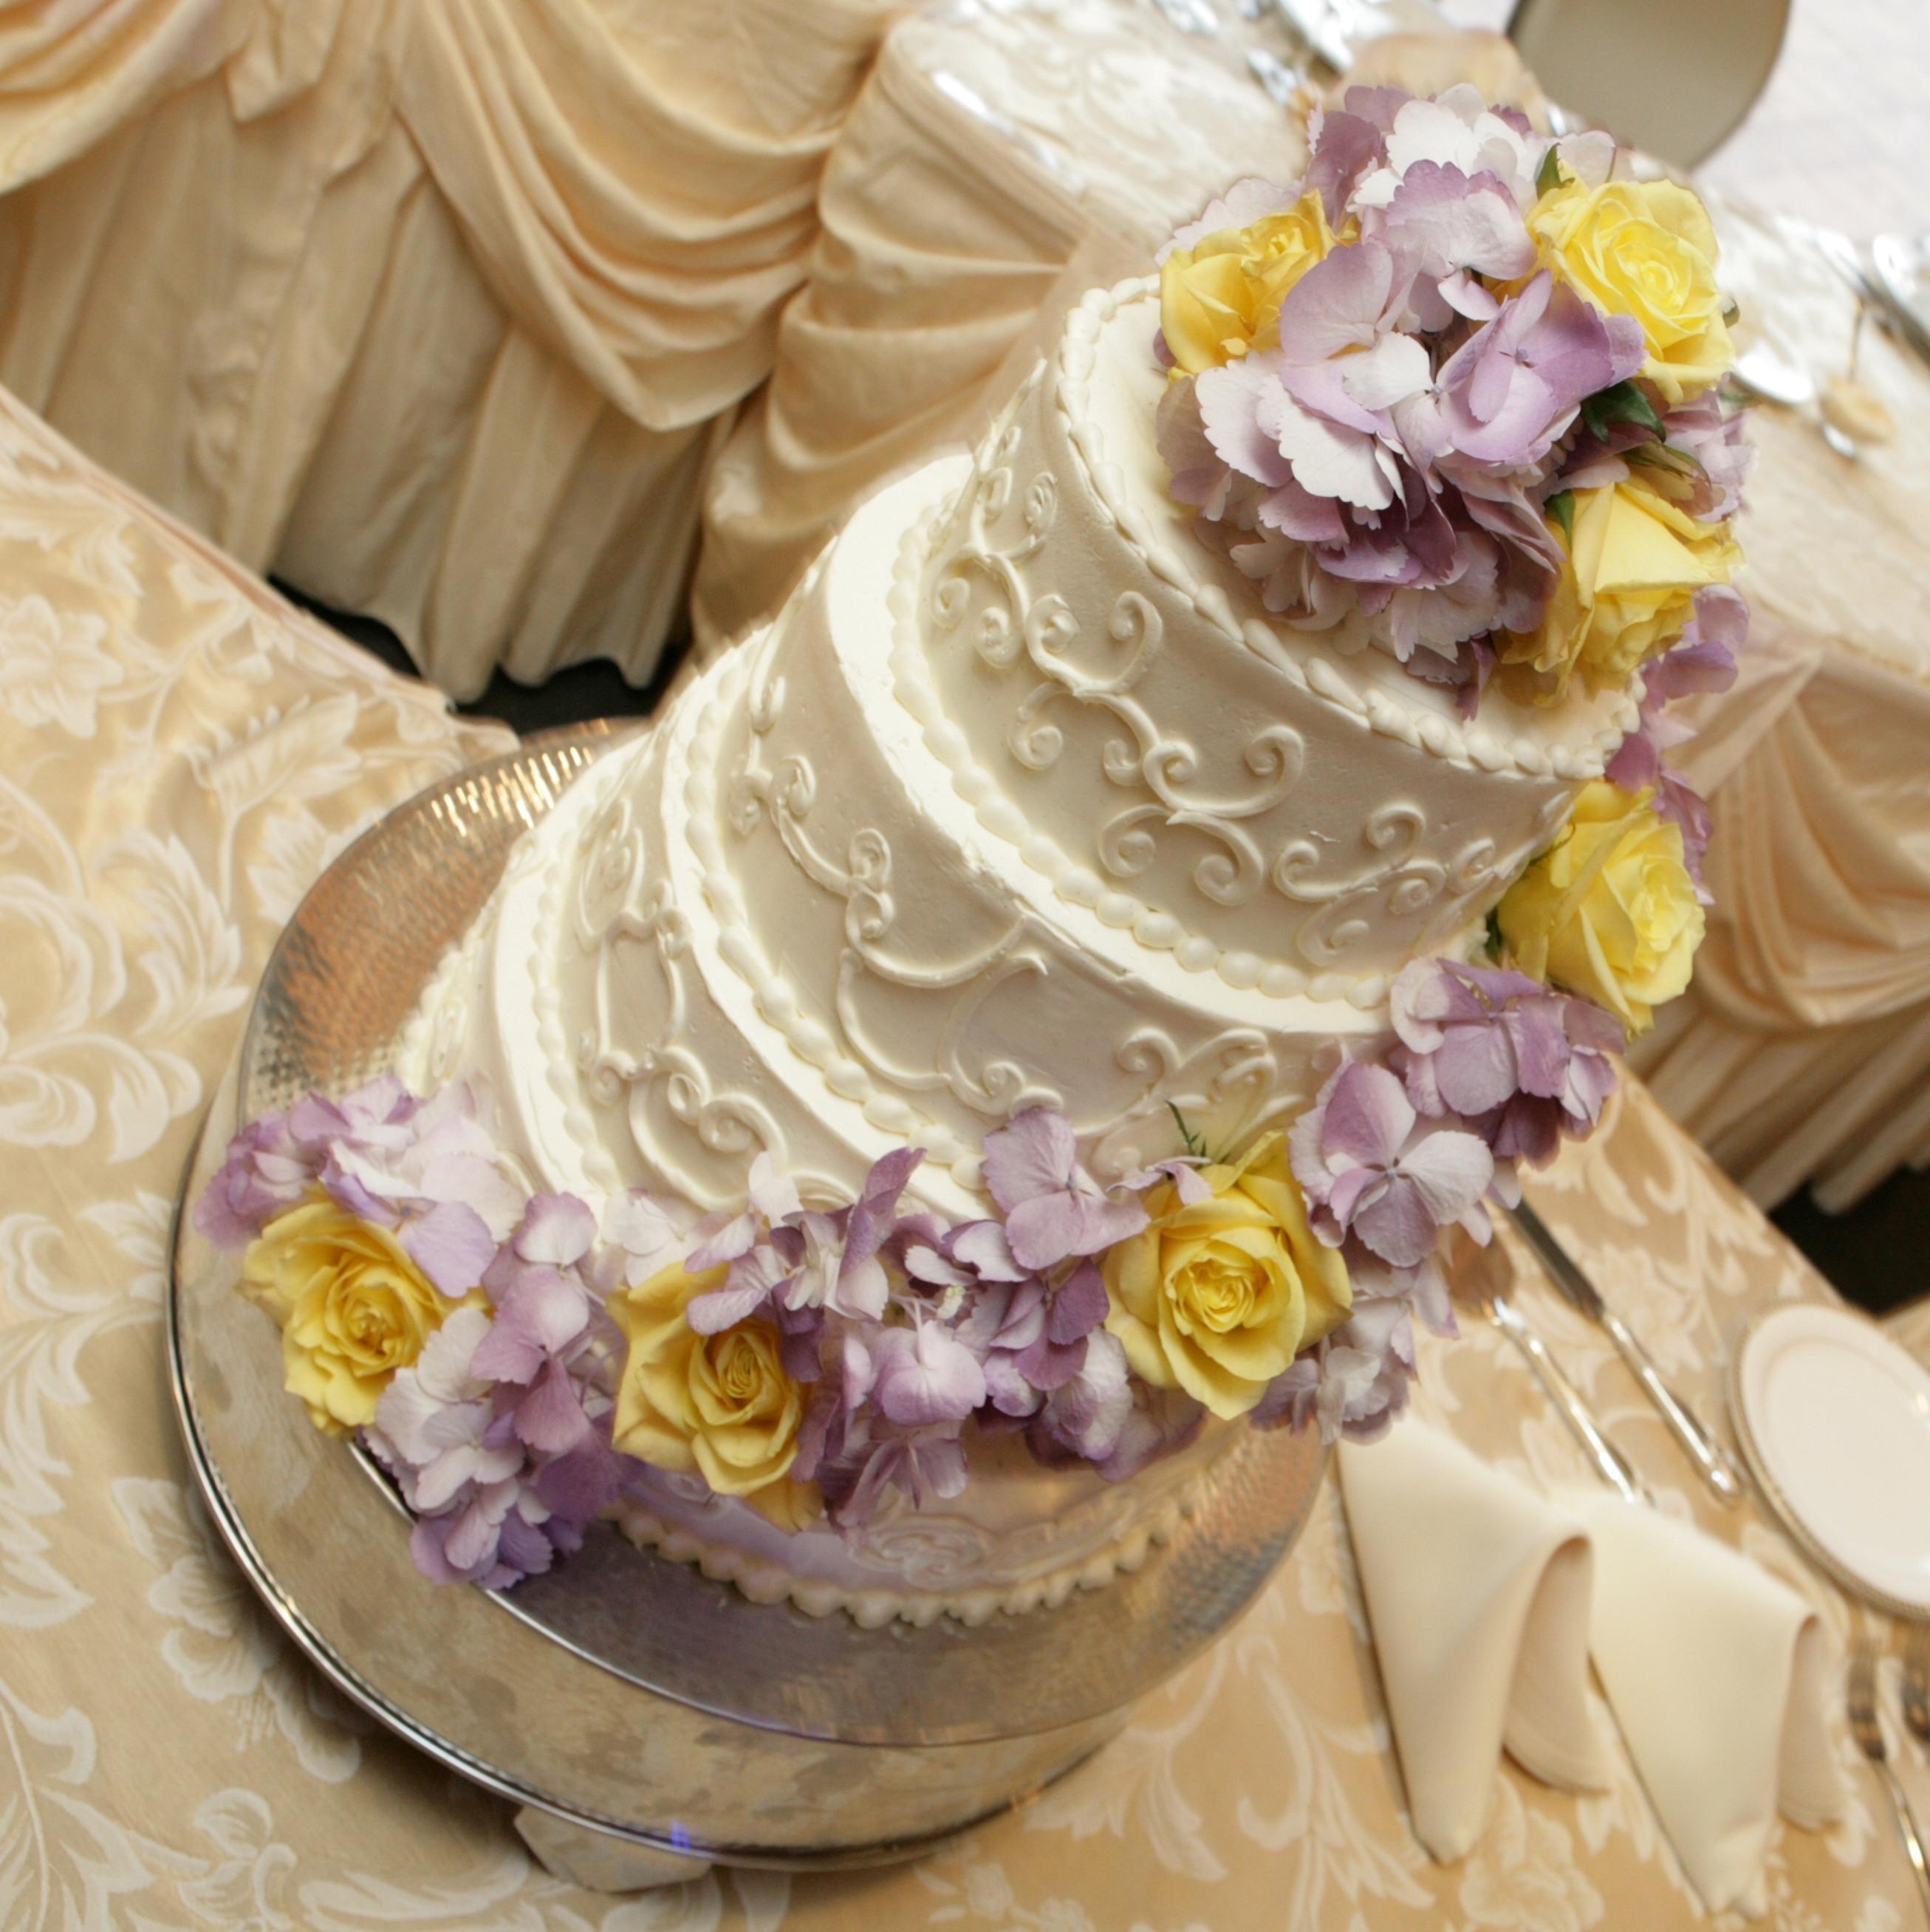 Purple And Yellow Wedding Cake  Cascade of Flowersvendors Monday Morning Flowers Project